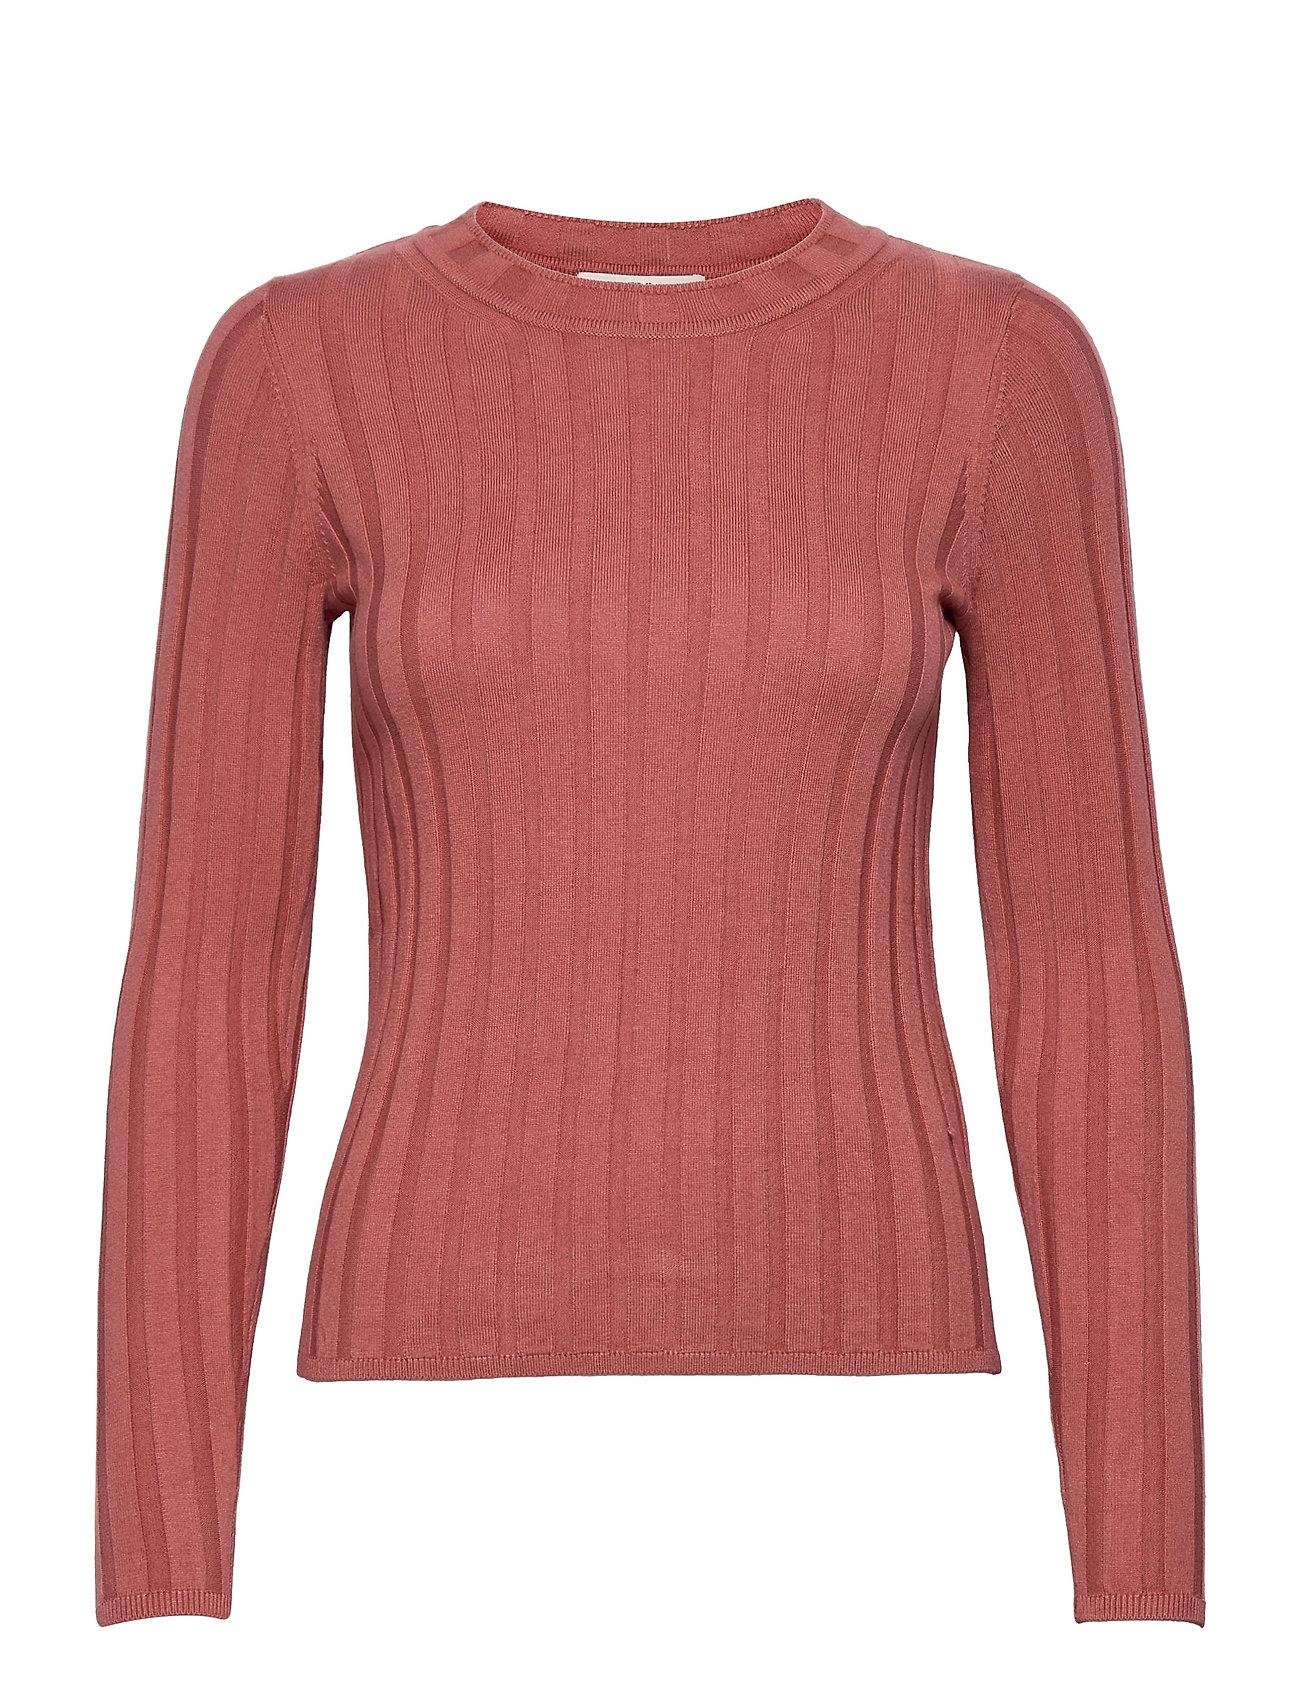 Sweaters Strikket Trøje Rød EDC By Esprit